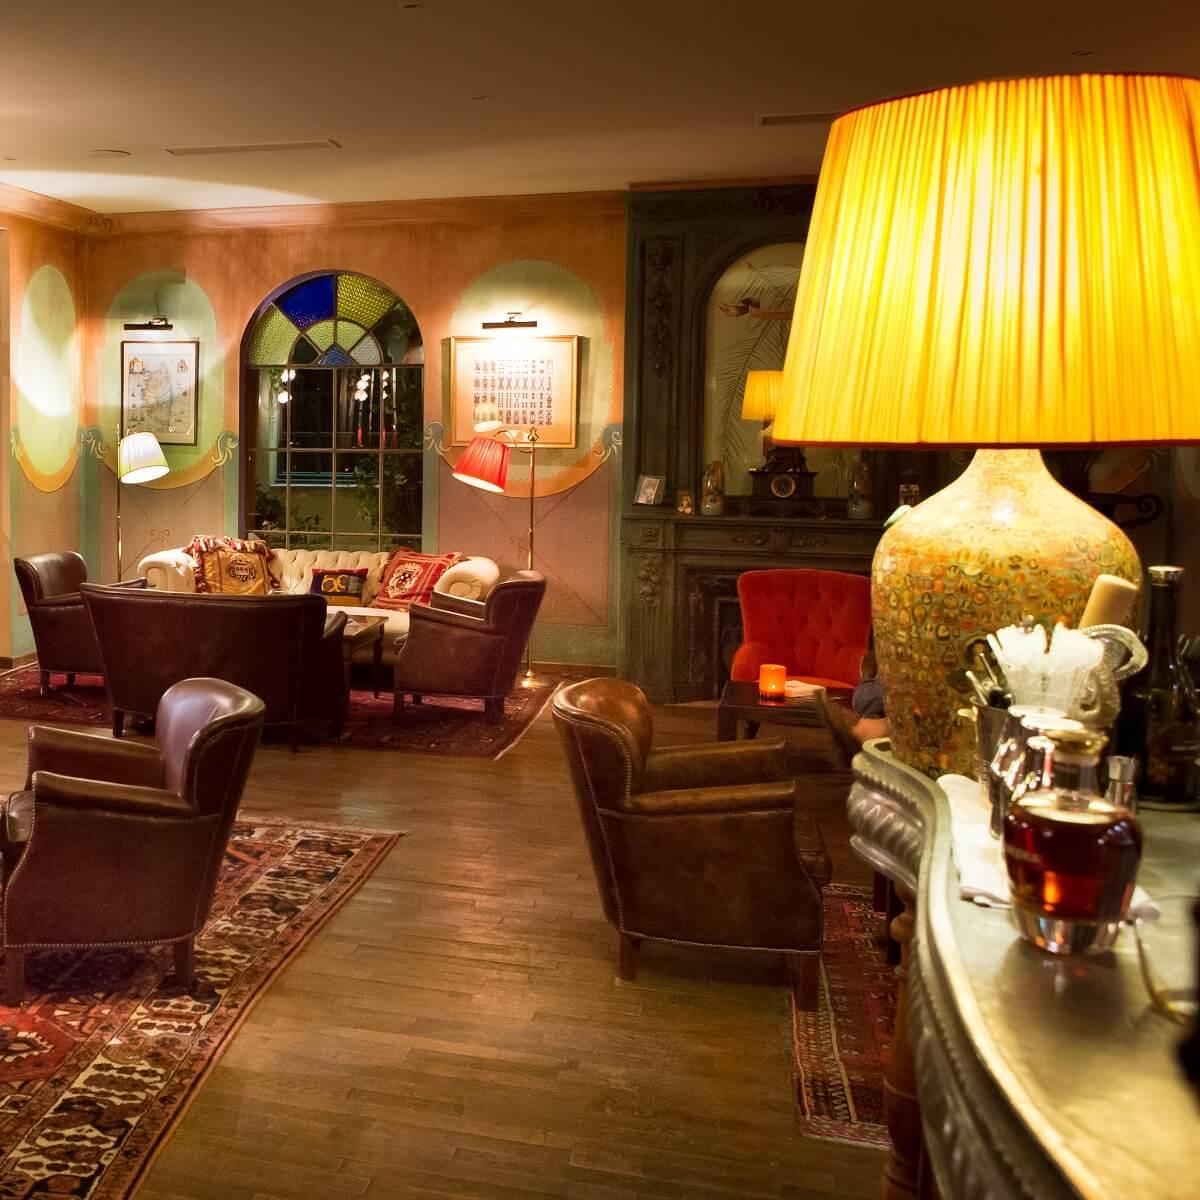 Bar - Hôtel La Signoria - Calvi - Corse du sud